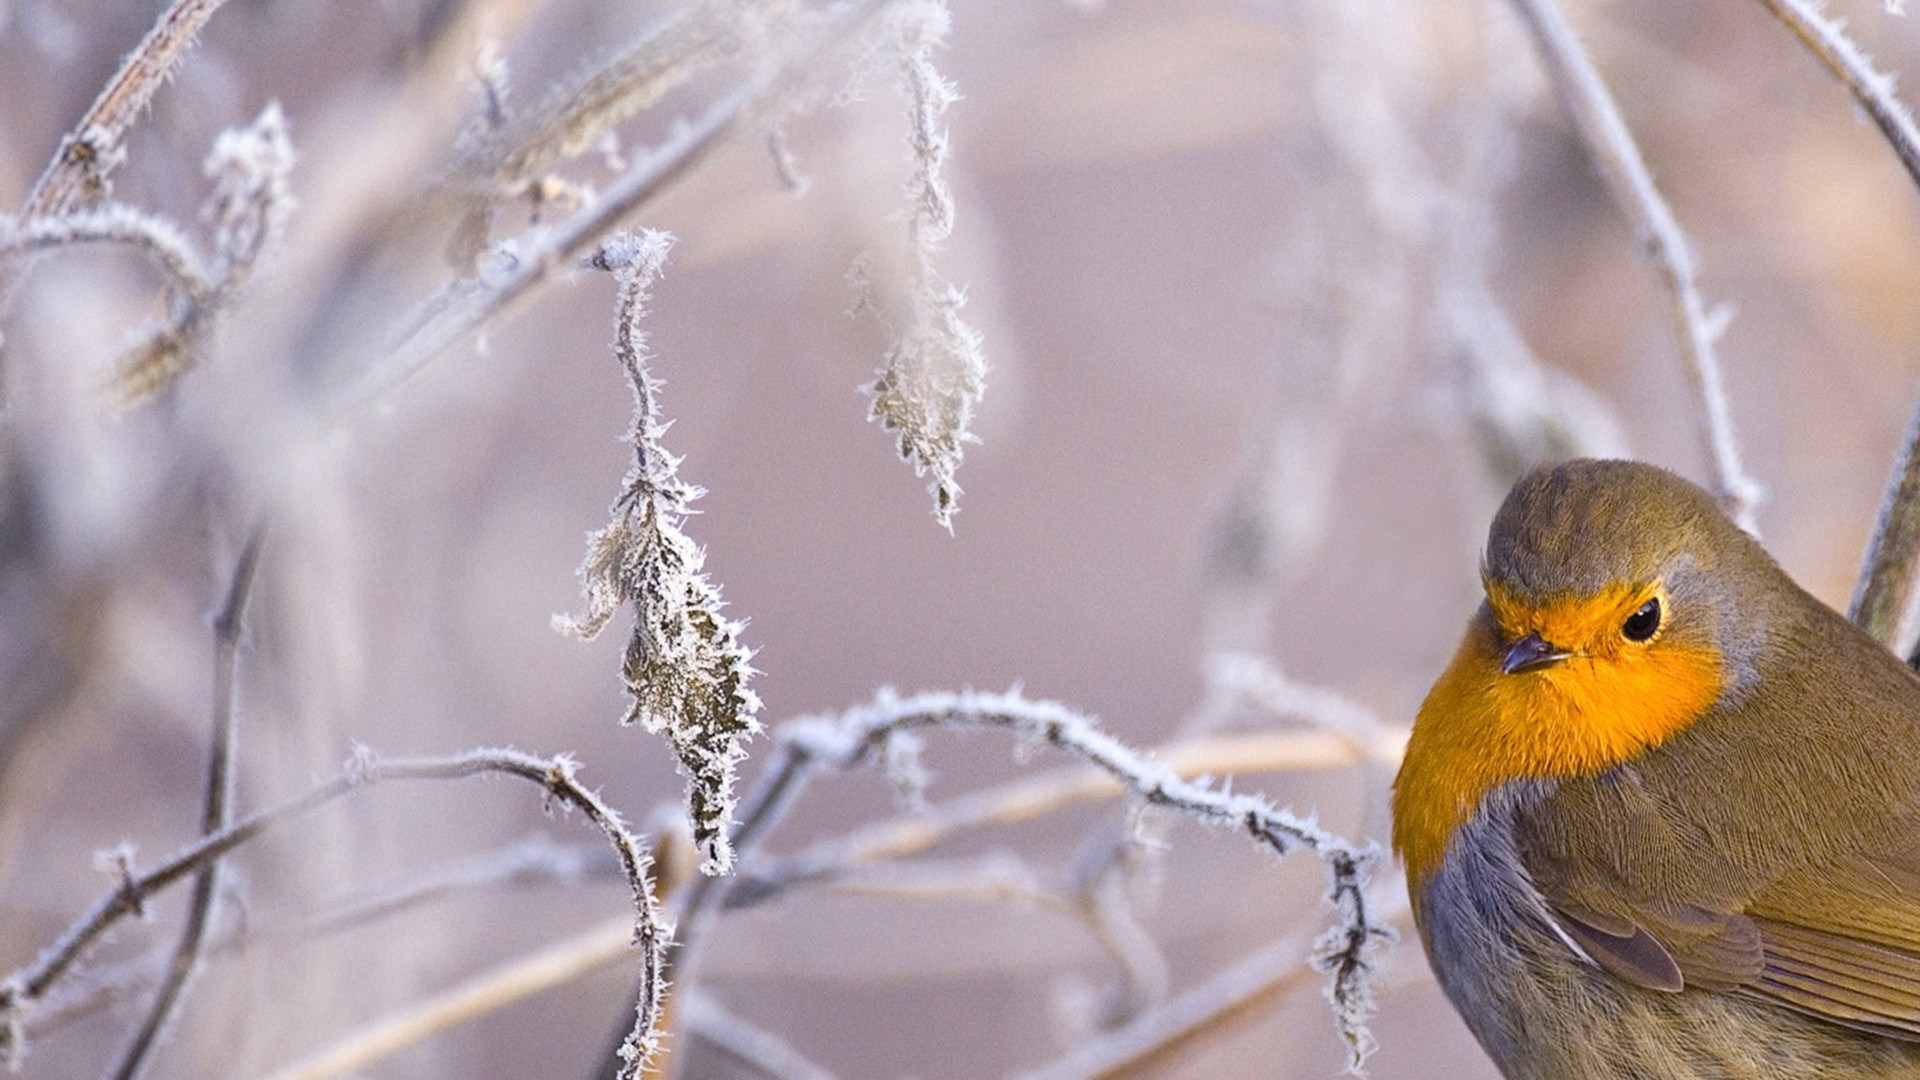 Snow Bird Wallpaper For Desktop